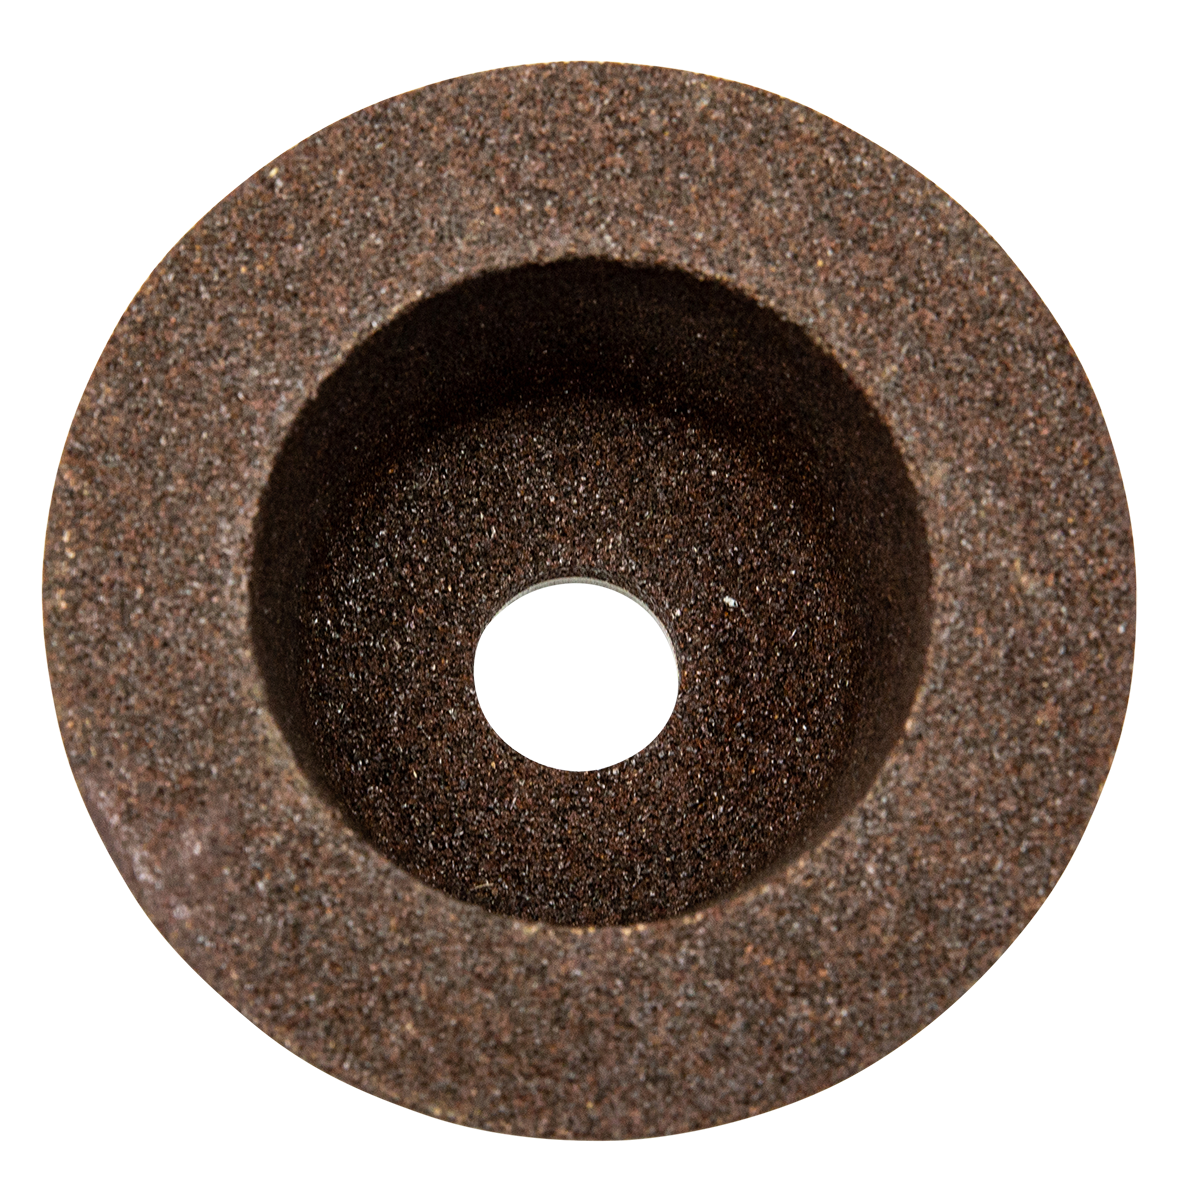 ABRASIVE CUP WHEEL STONE / THREADED